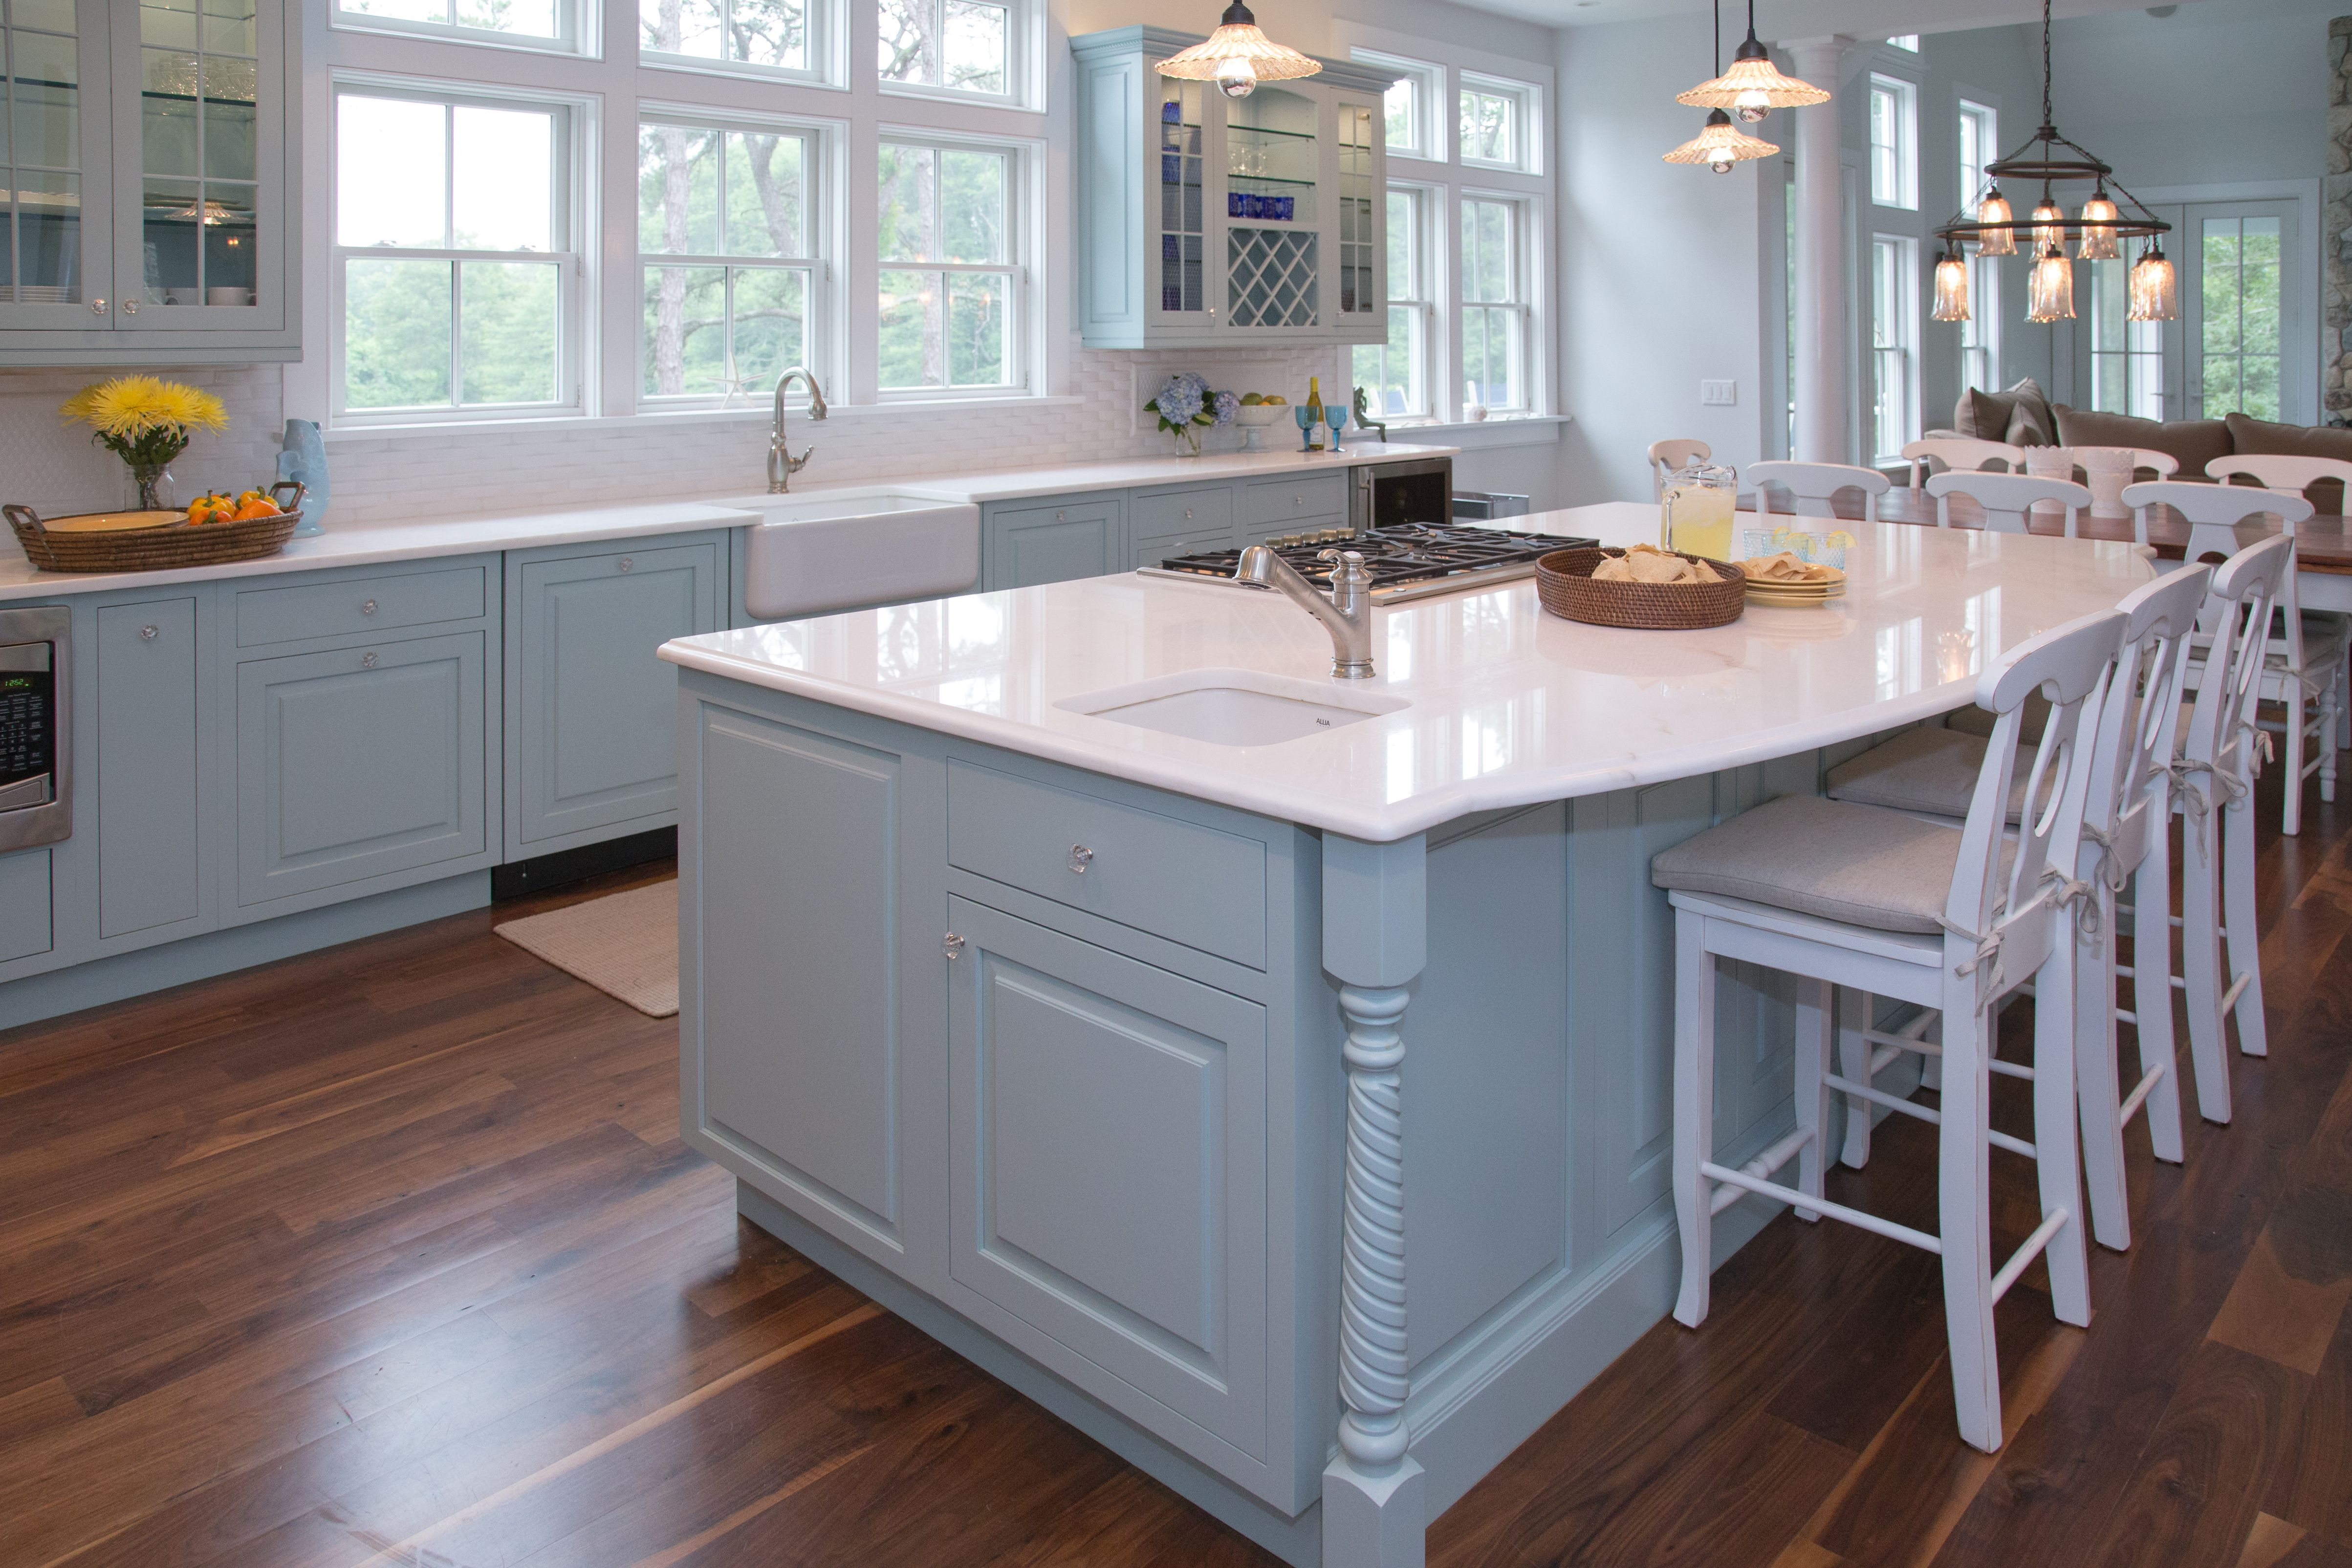 Custom Kitchen Design | Seaside Vacation Home | Designed ...